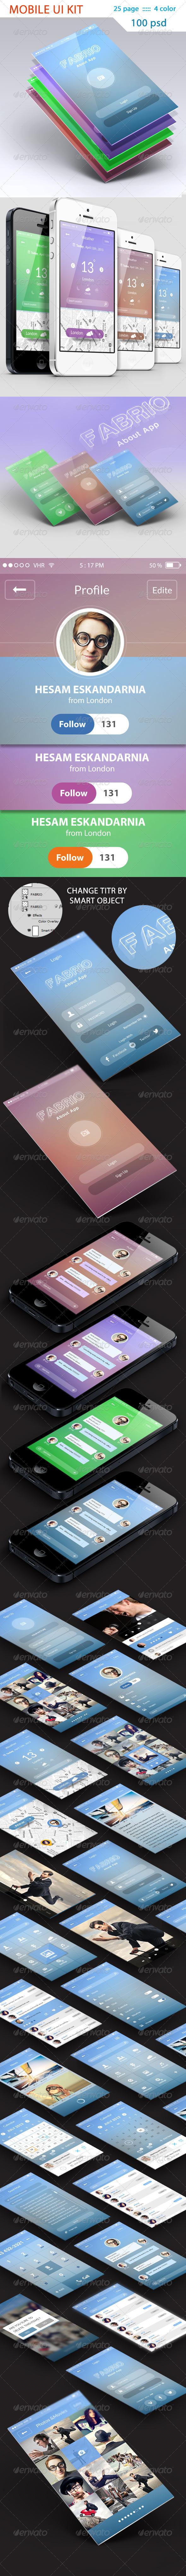 GraphicRiver UI KIT Mobile 4 Color Creative 6024032